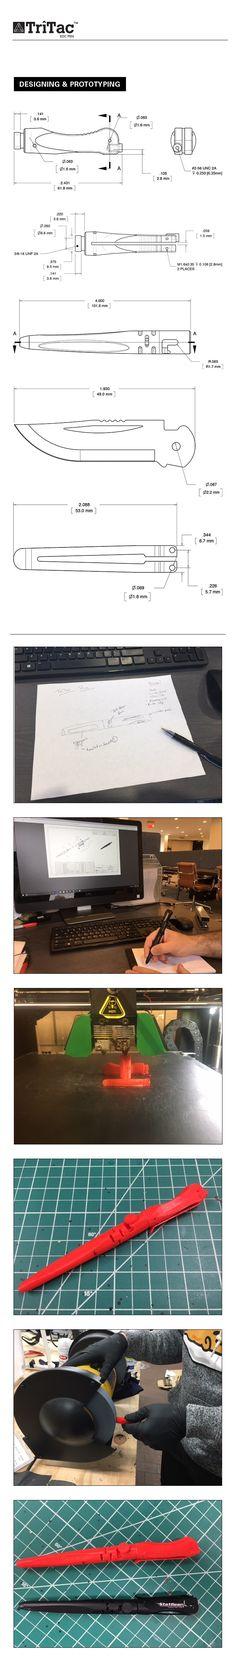 TriTac EDC Pen - It's a Pen, It's a Punch, It's a Knife by StatGear — Kickstarter. The design of the TriTac EDC Pen cuts no corners in design or materials.